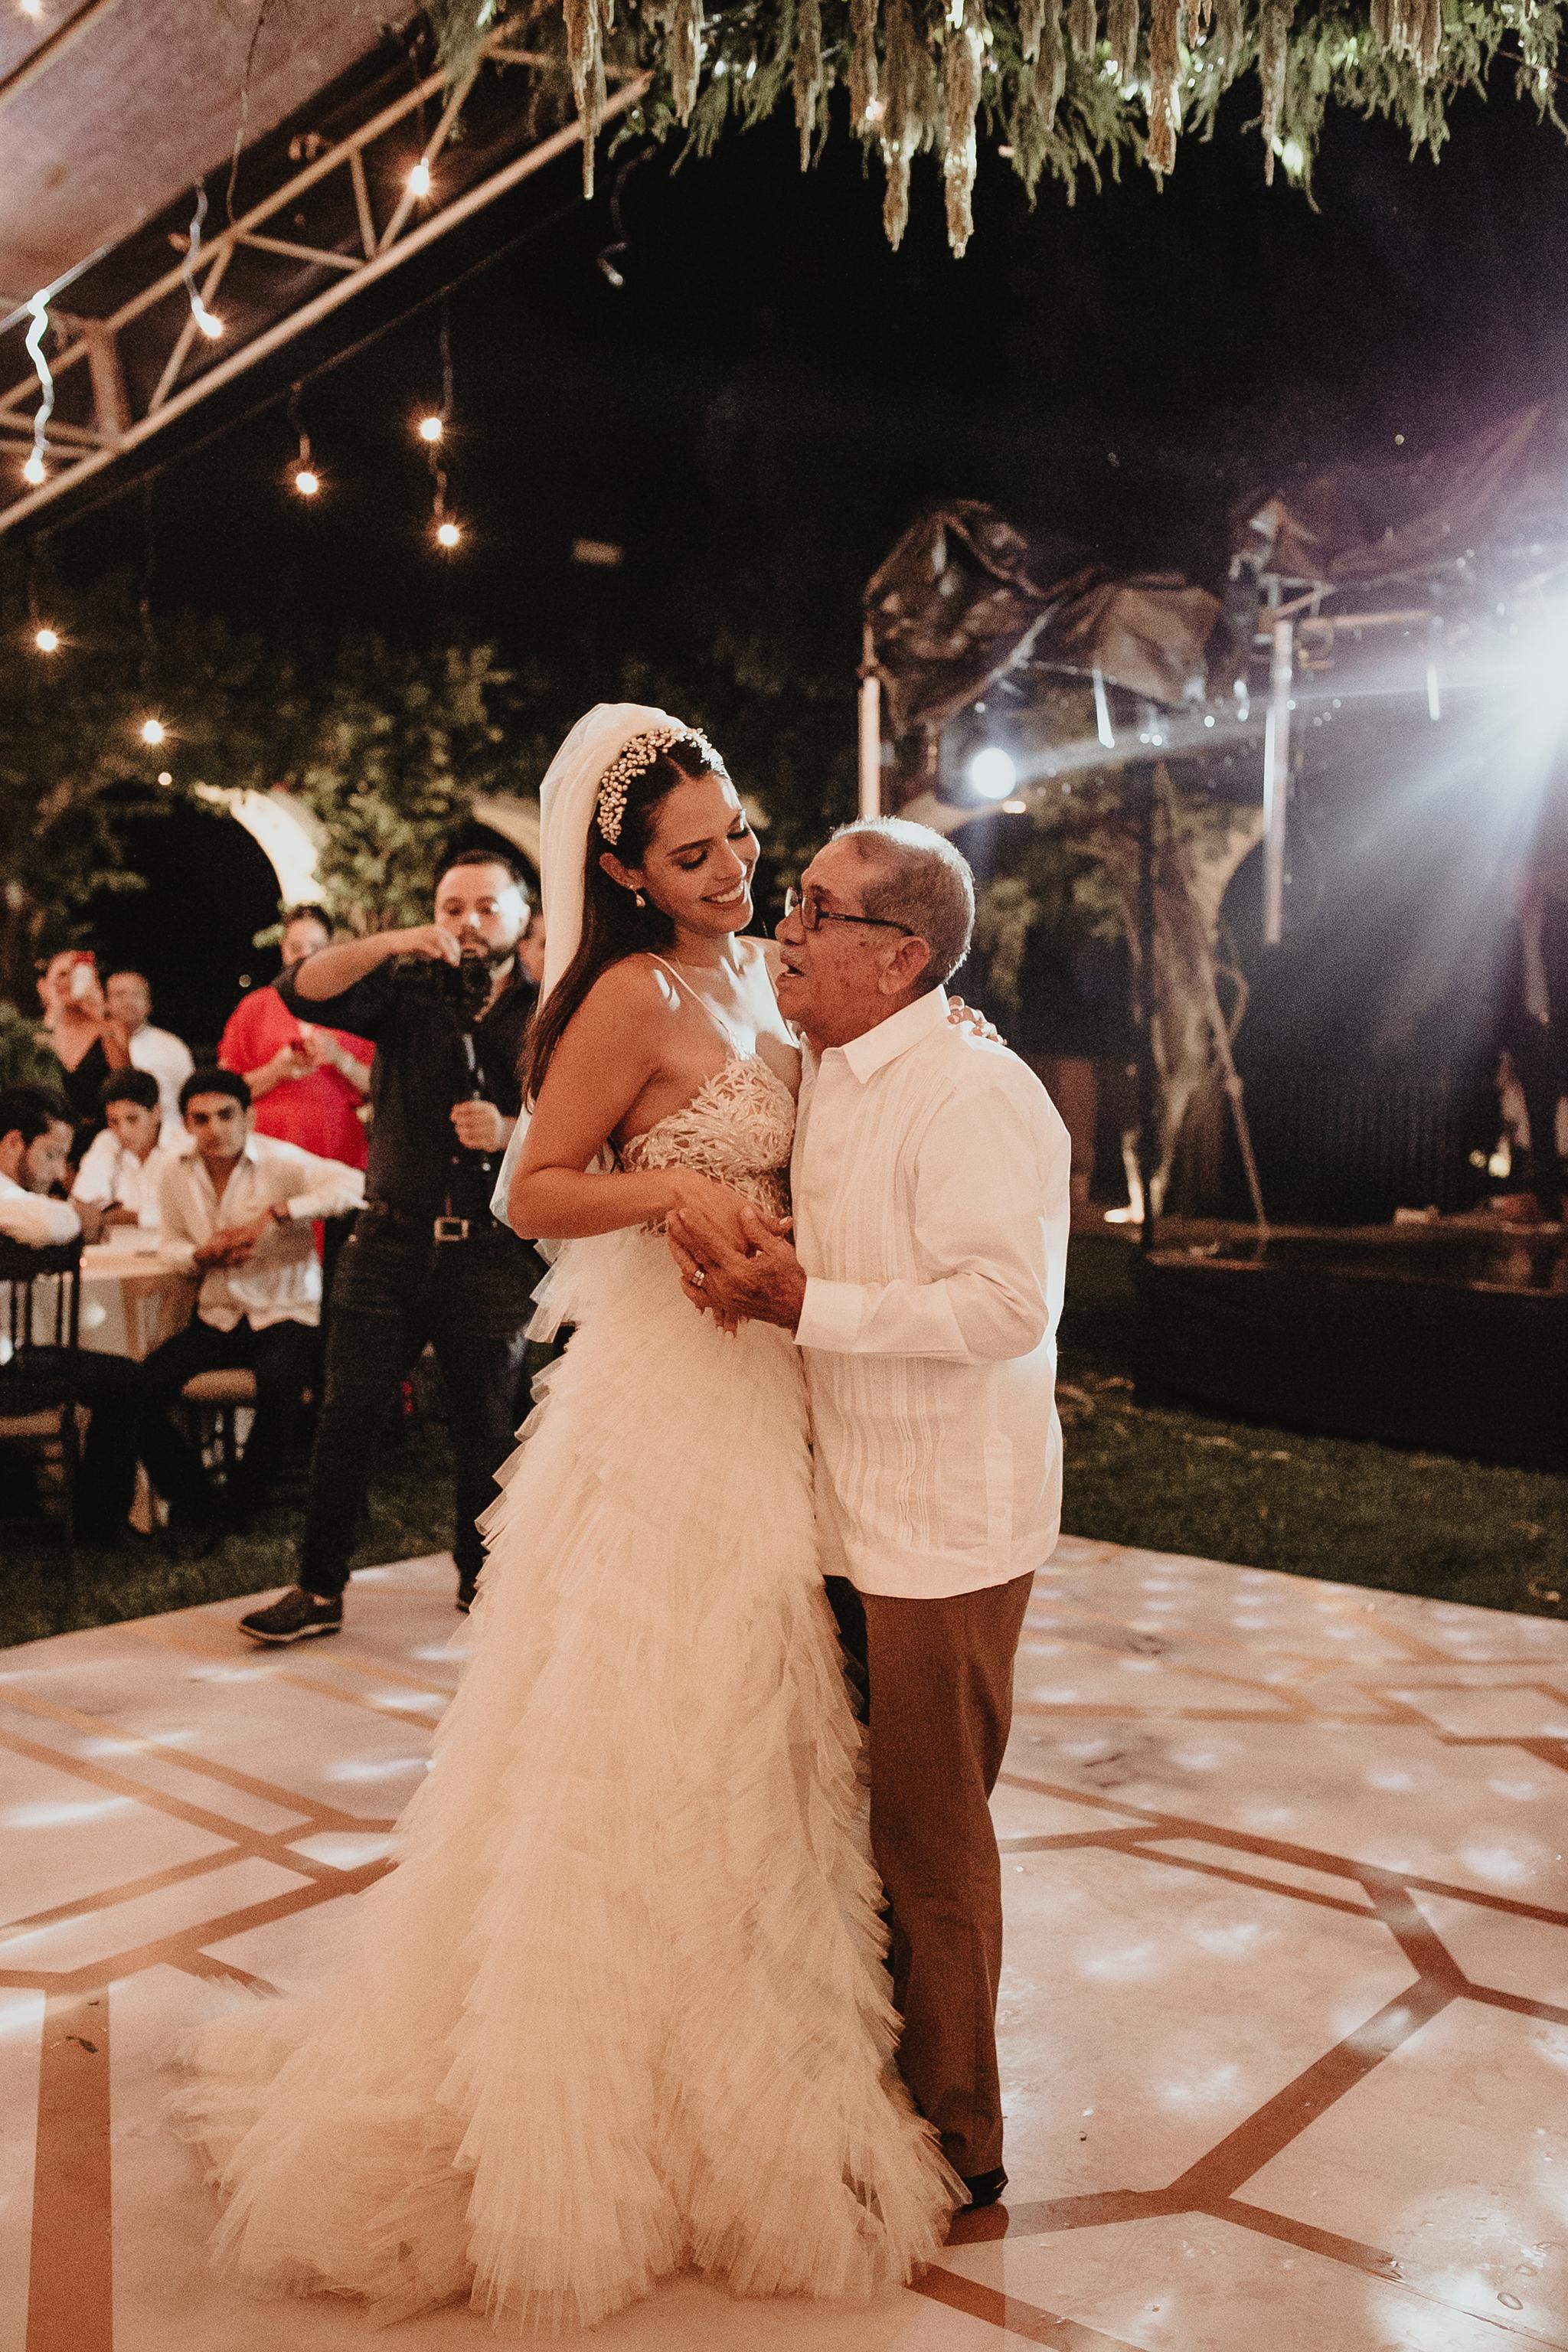 1068R&F__WeddingDestination_Weddingmerida_BodaMexico_FotografoDeBodas_FabrizioSimoneenFotografo.jpg